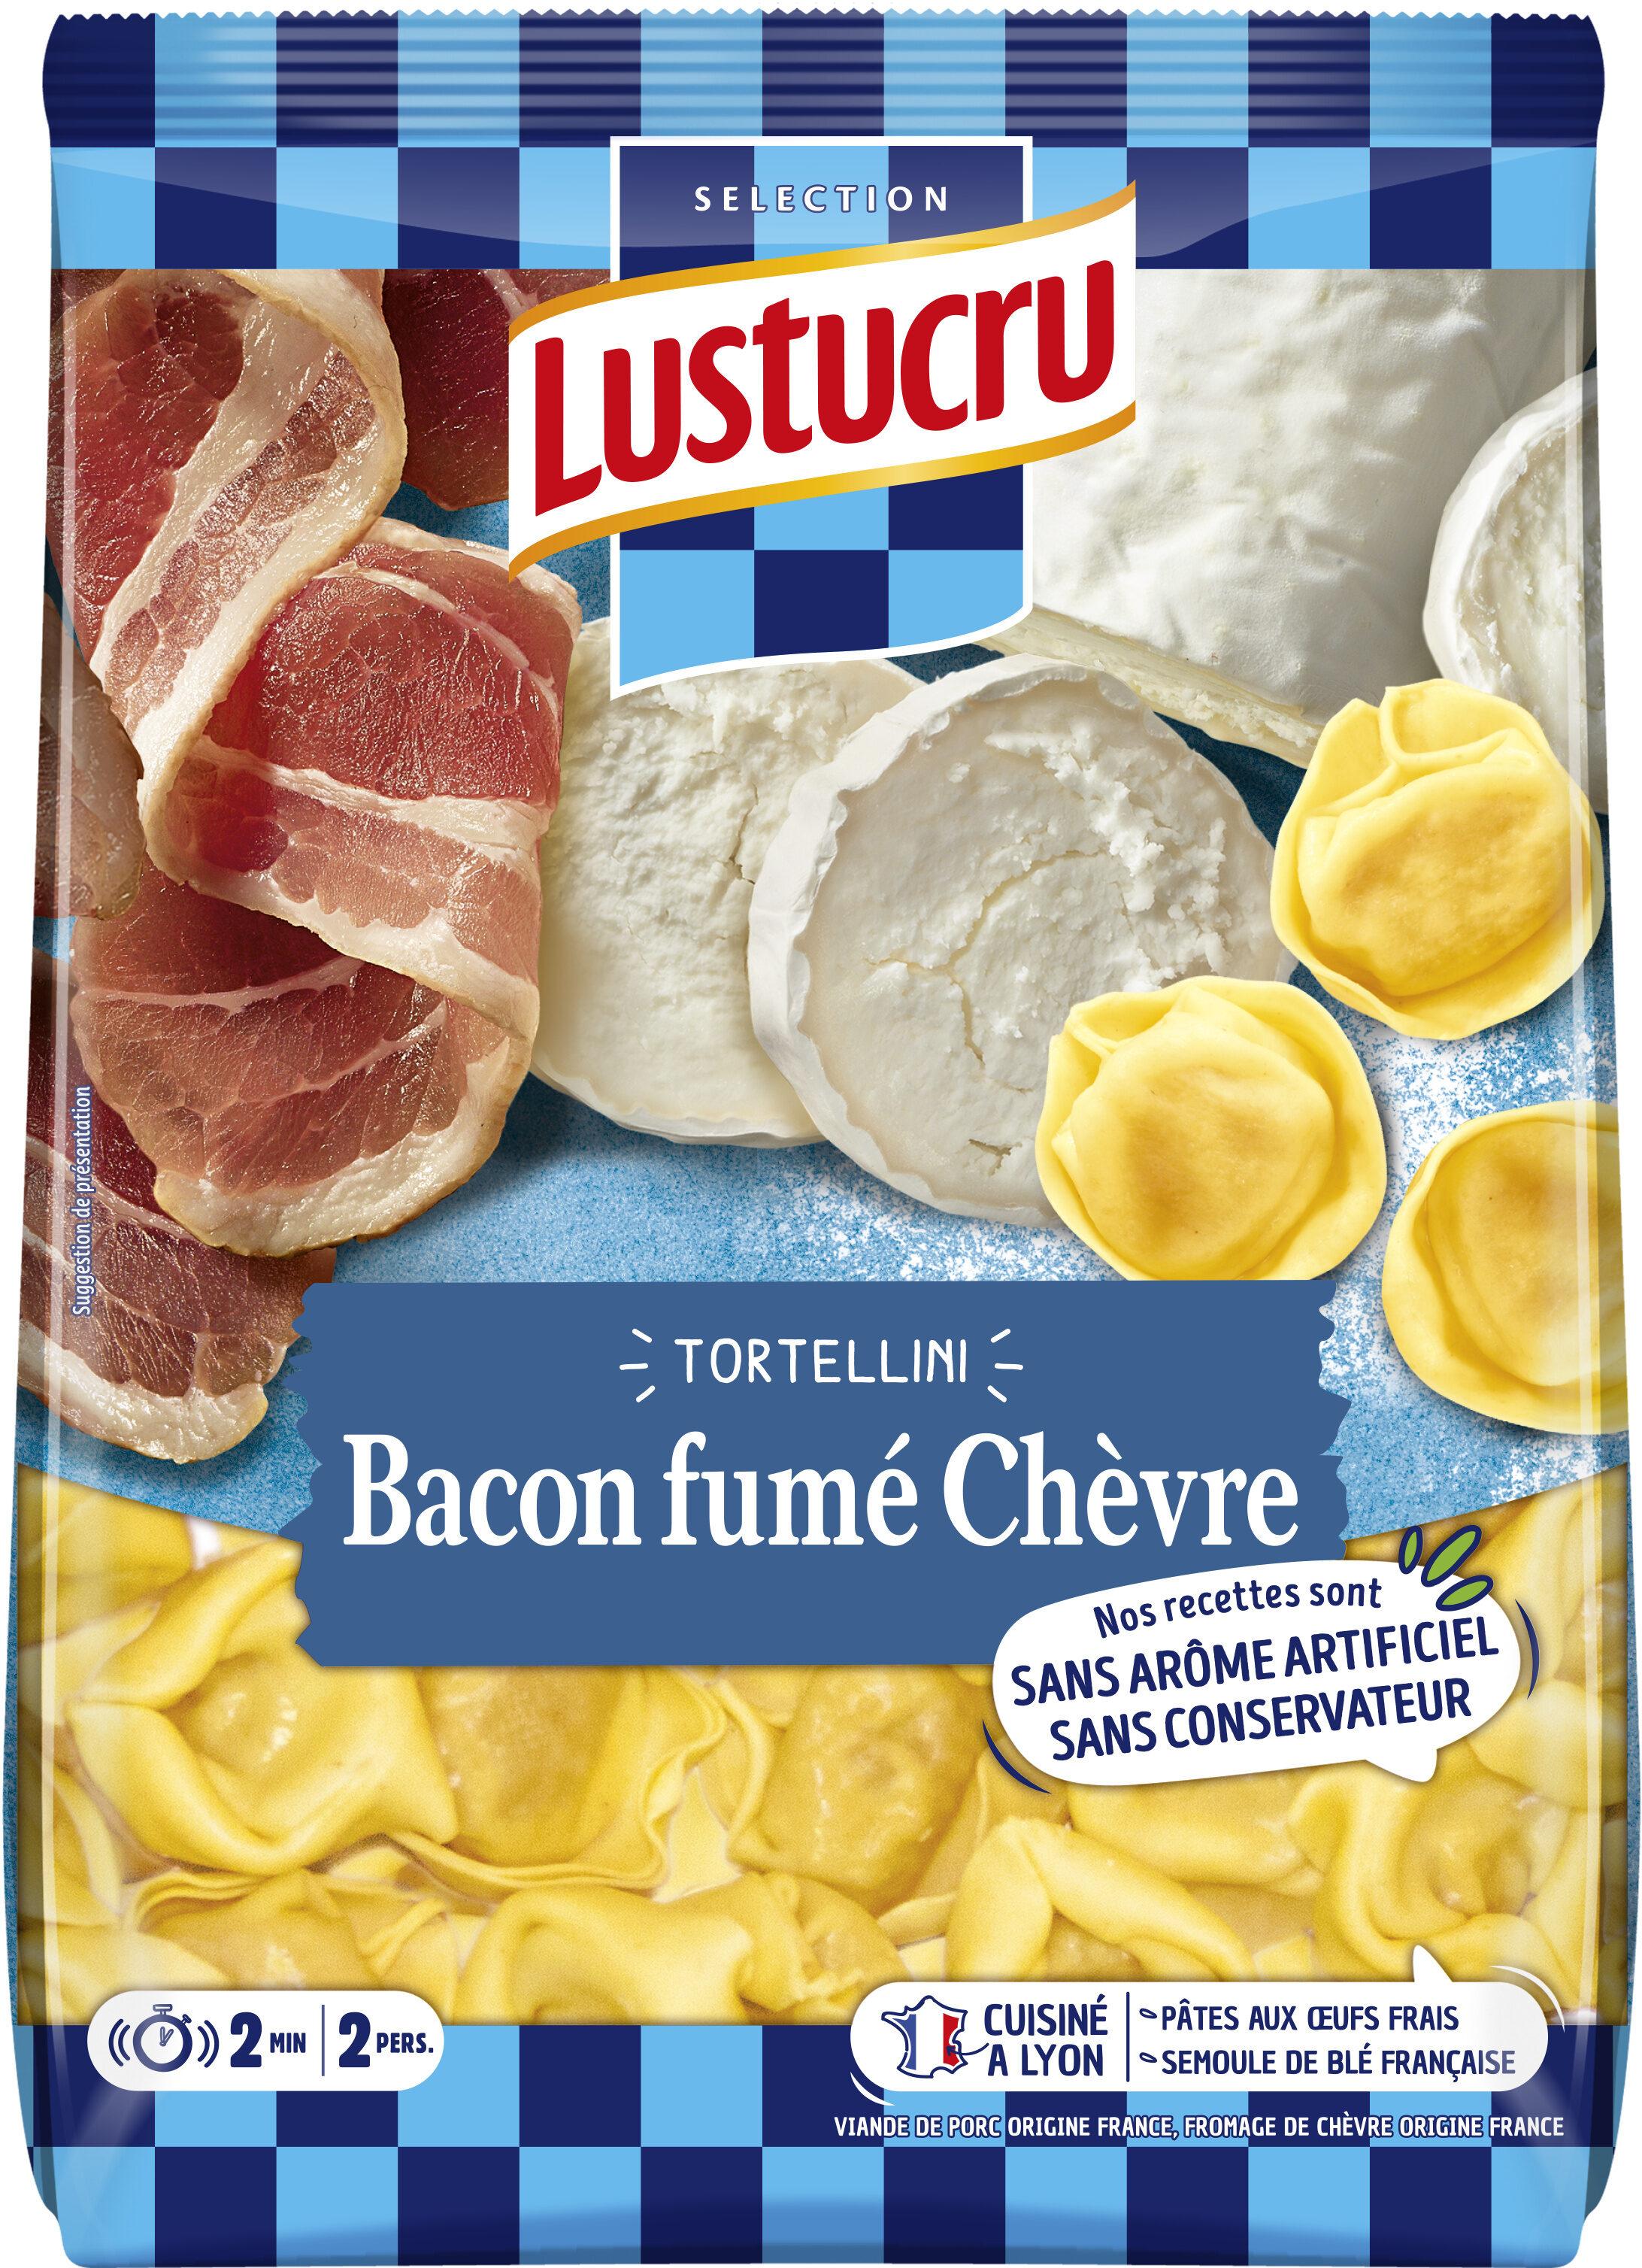 Tortellini bacon chevre 250g lustucru x8 - Product - fr